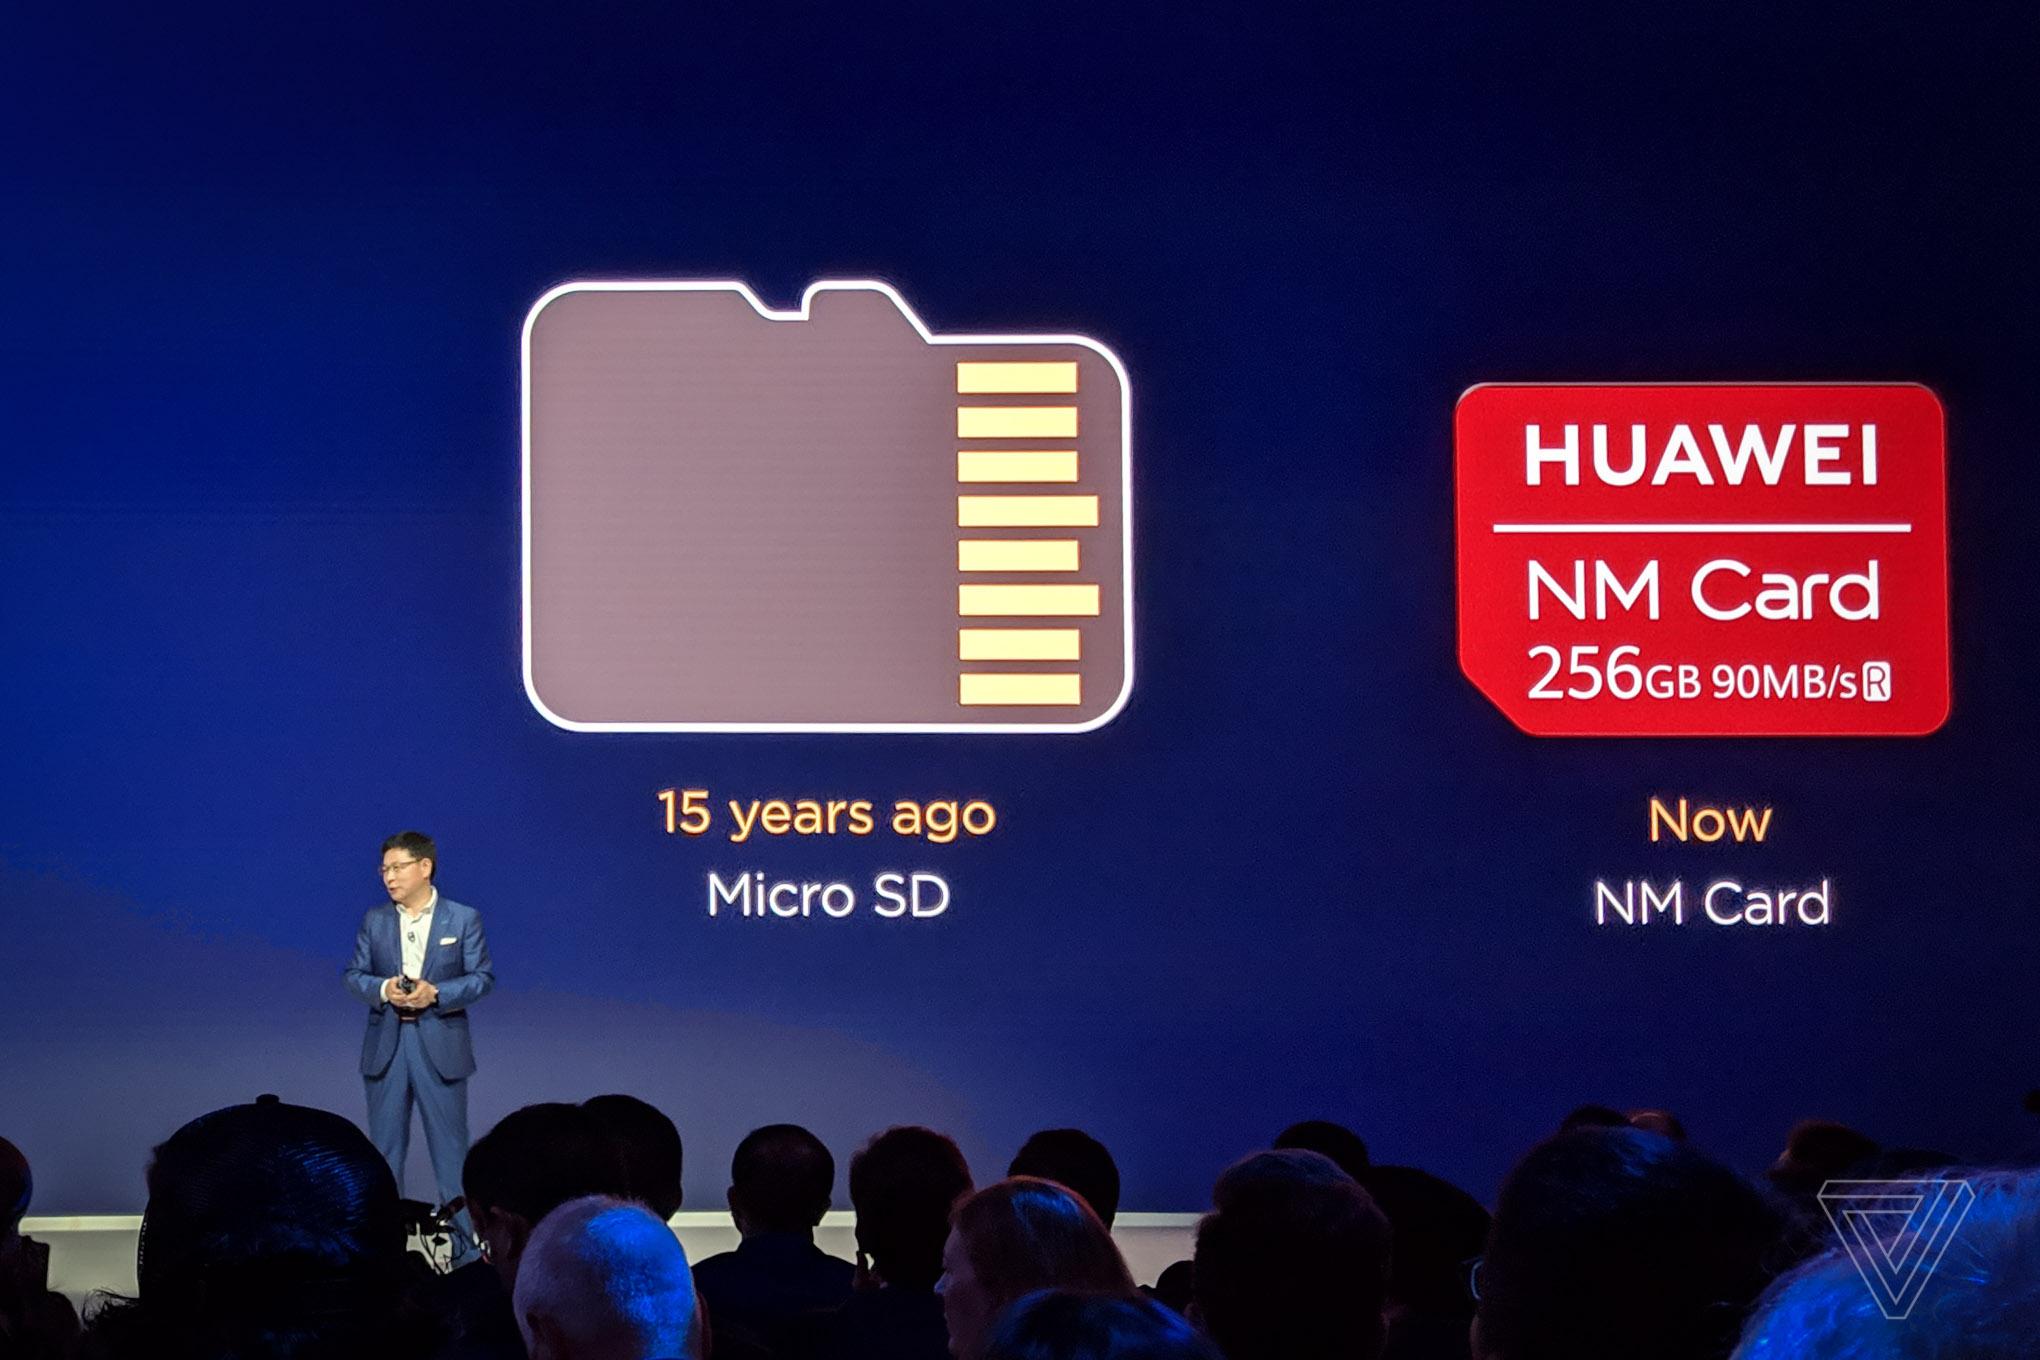 Huawei NM Card 359654 1